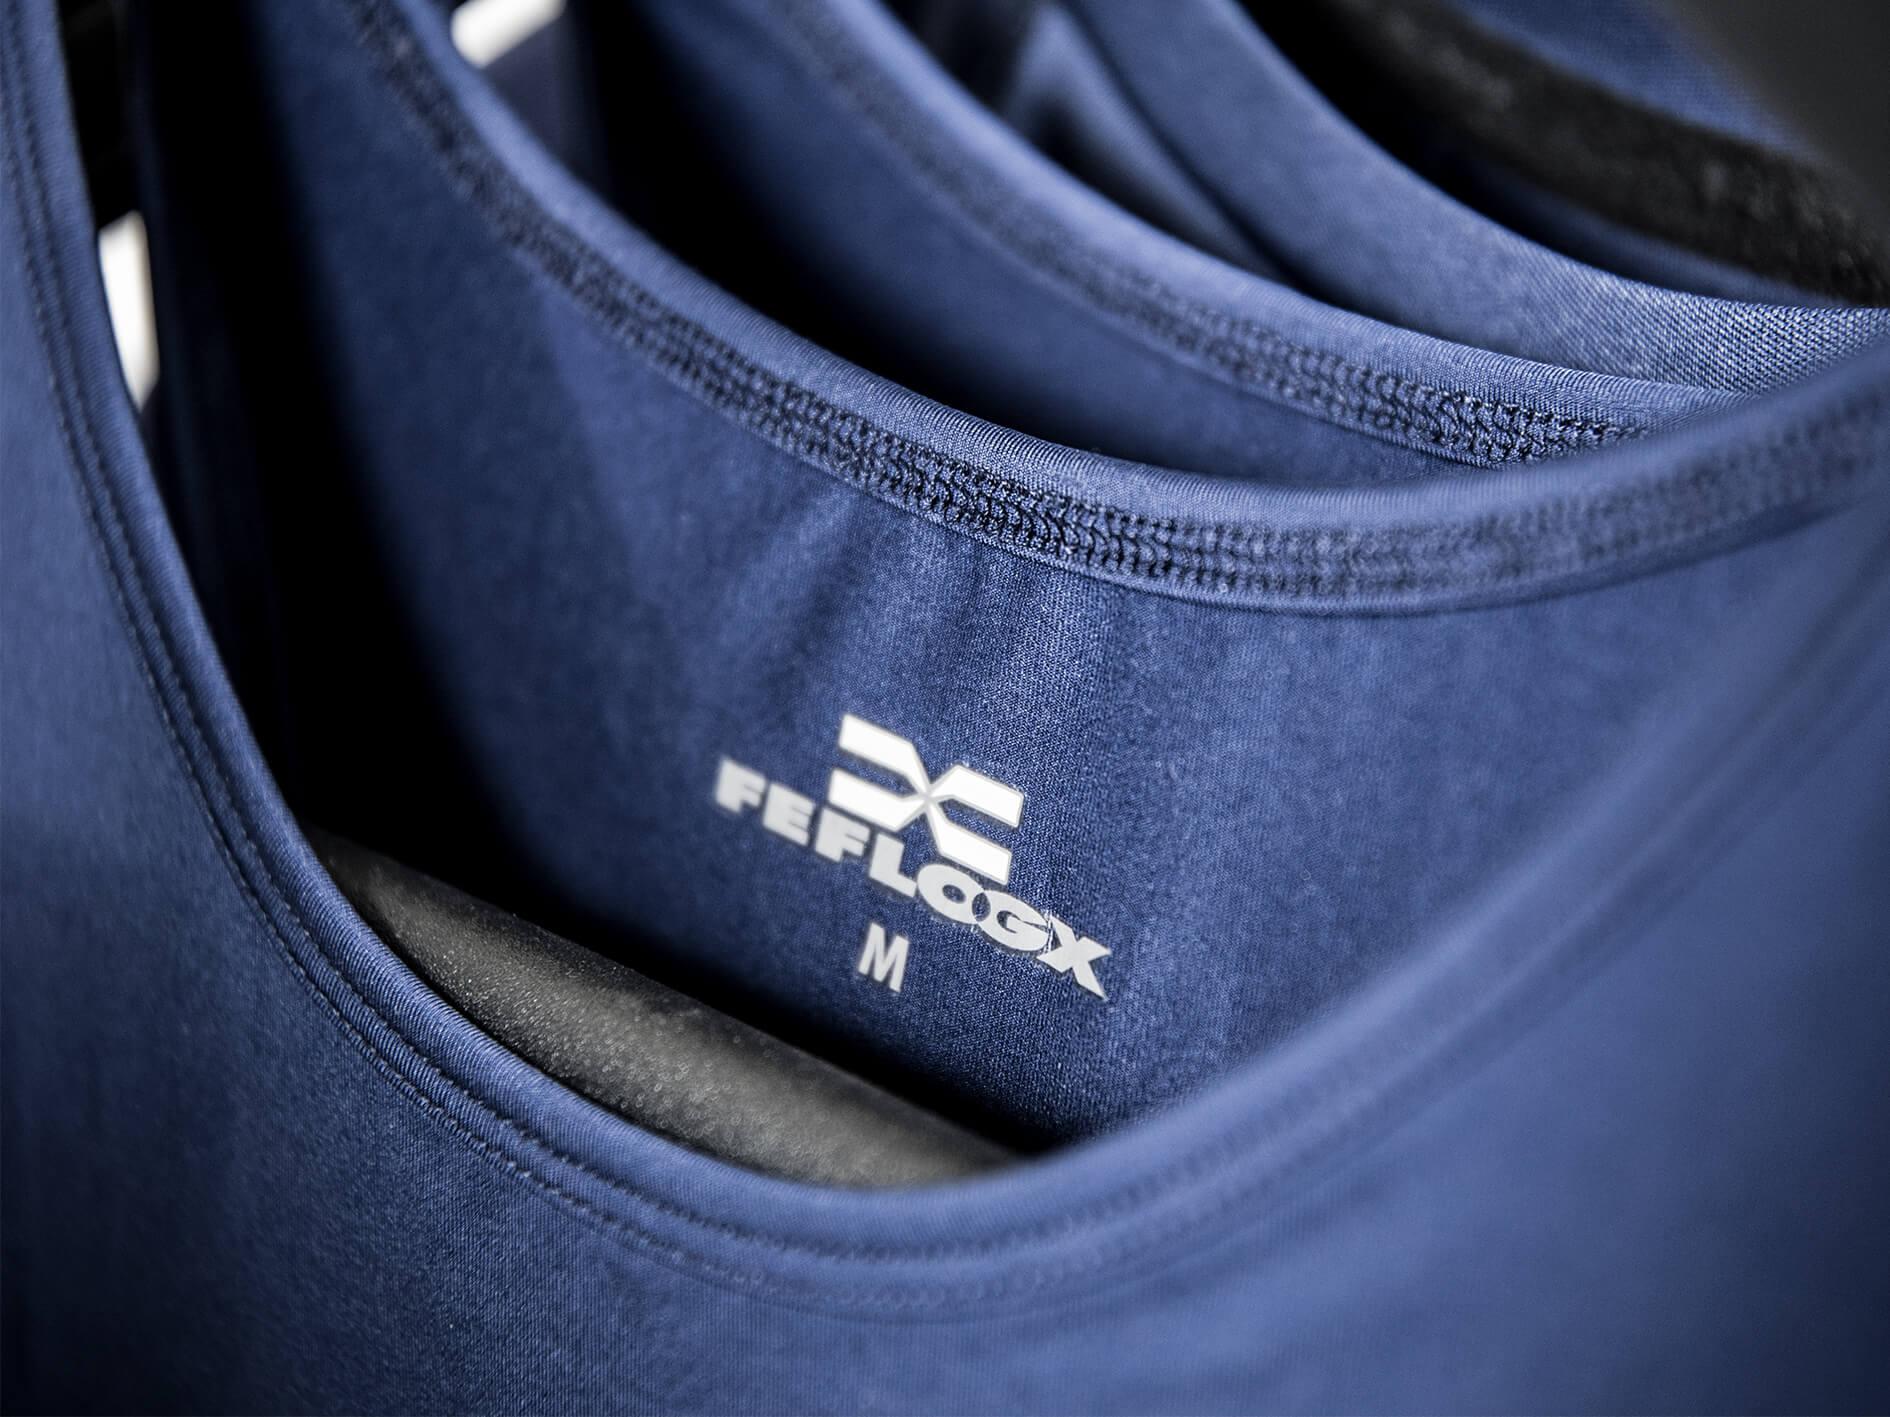 FEFLOGX Sportswear Functional Tank-Top Pure, Detail-Foto (1).